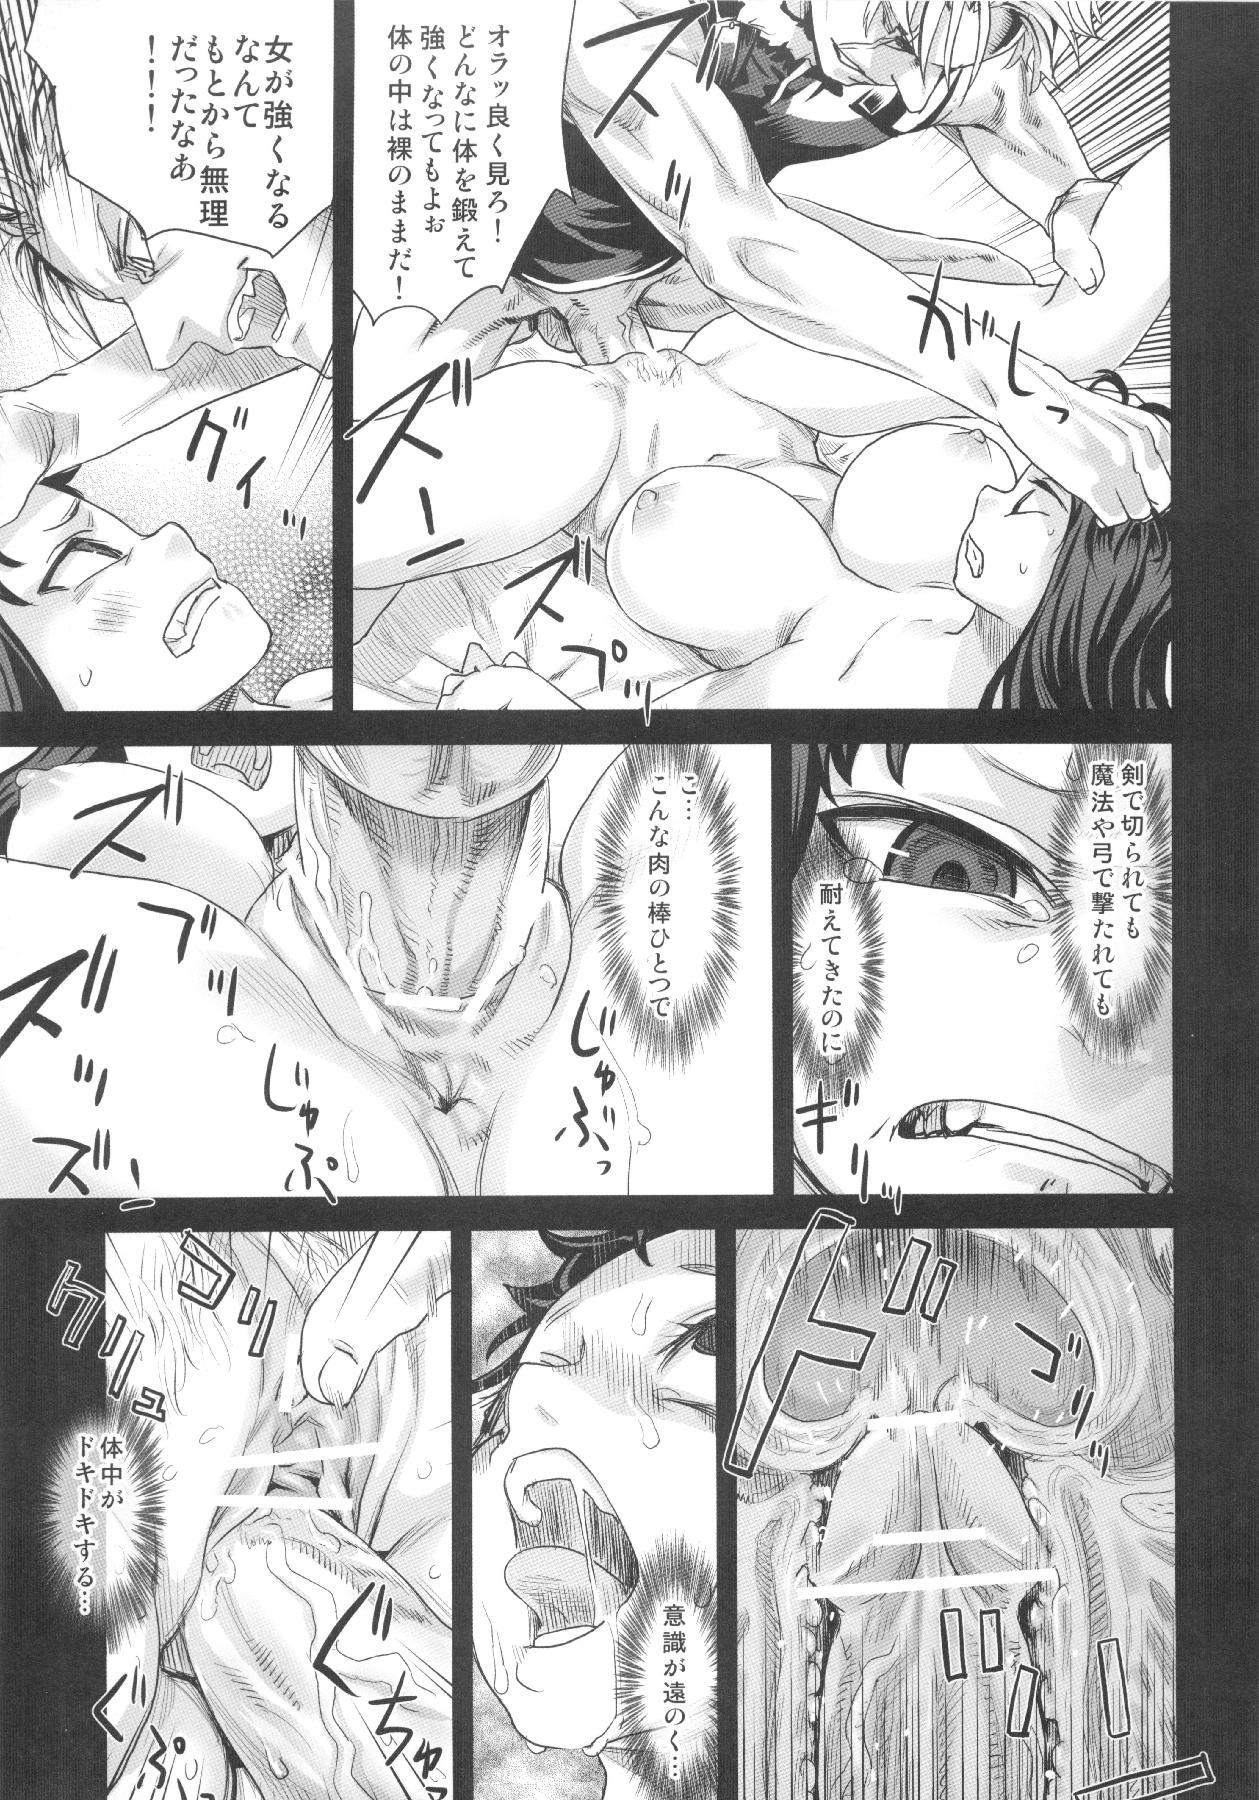 (C83) [Fatalpulse (Asanagi)] VictimGirls Compiled Vol.1 -Victimgirls Soushuuhen 1- MMO Game Selection (Various) 131